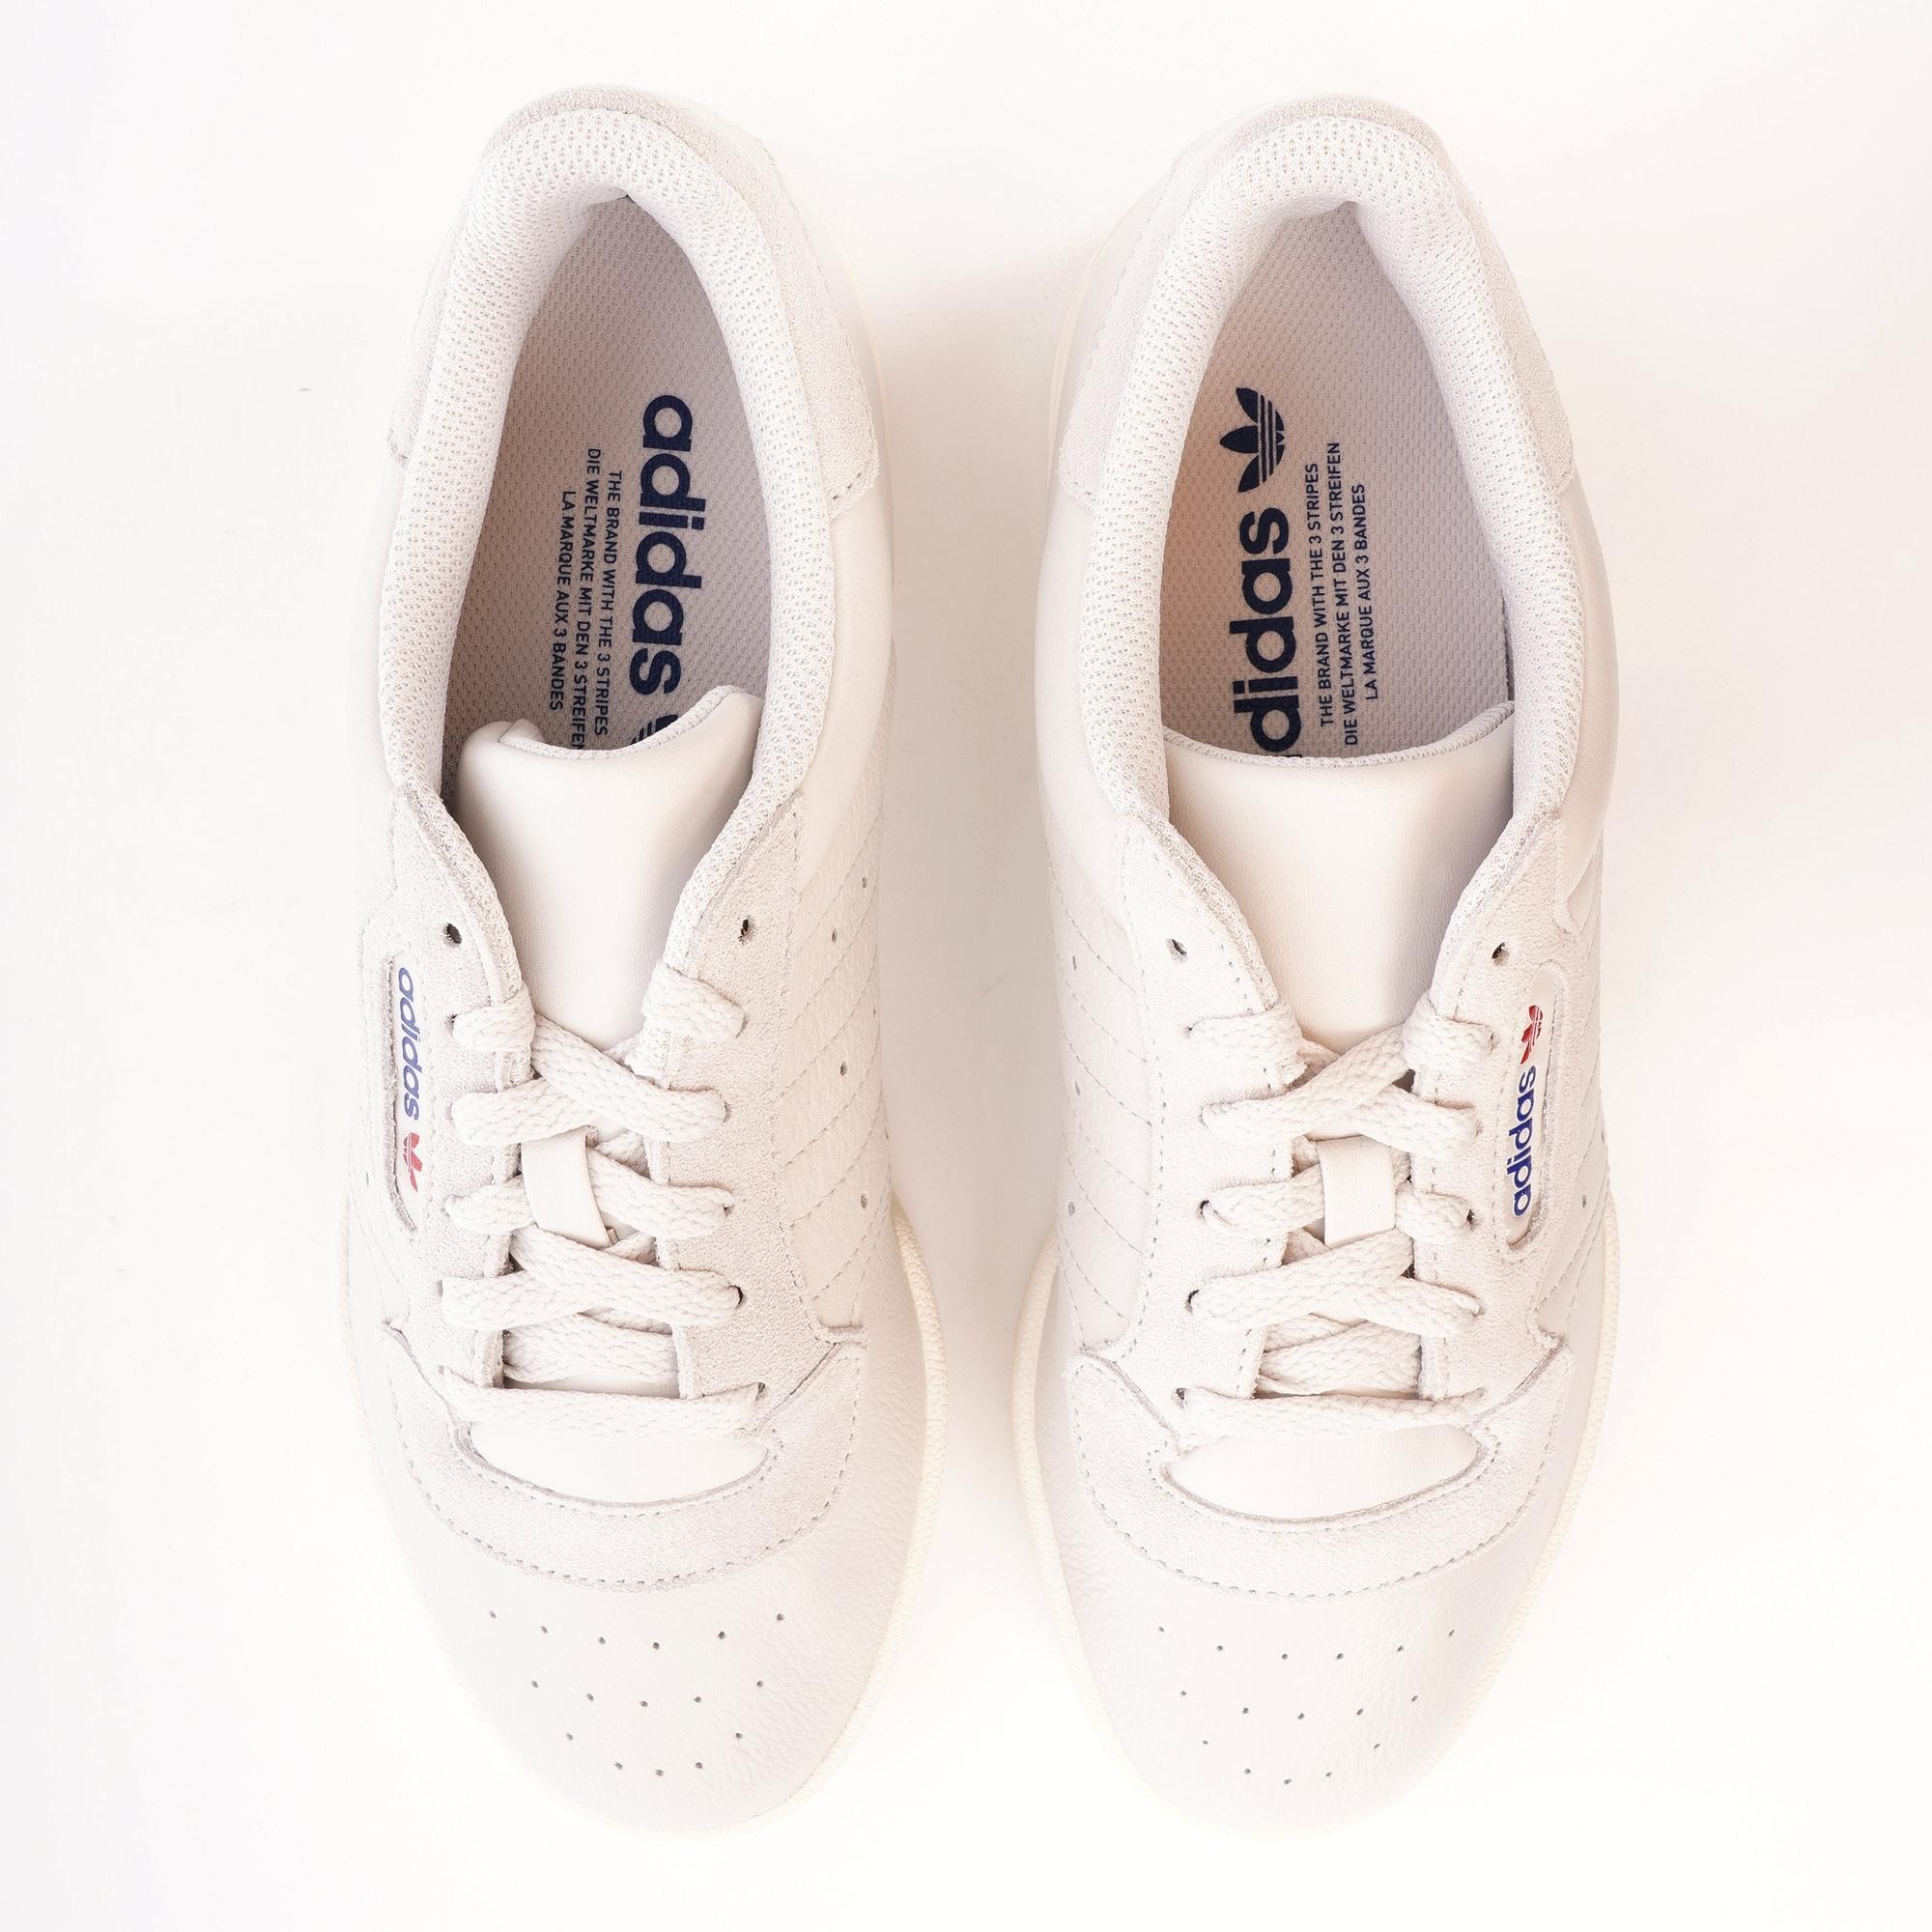 8e35e92c adidas Originals Powerphase - Grey One & Off White in Gray for Men ...